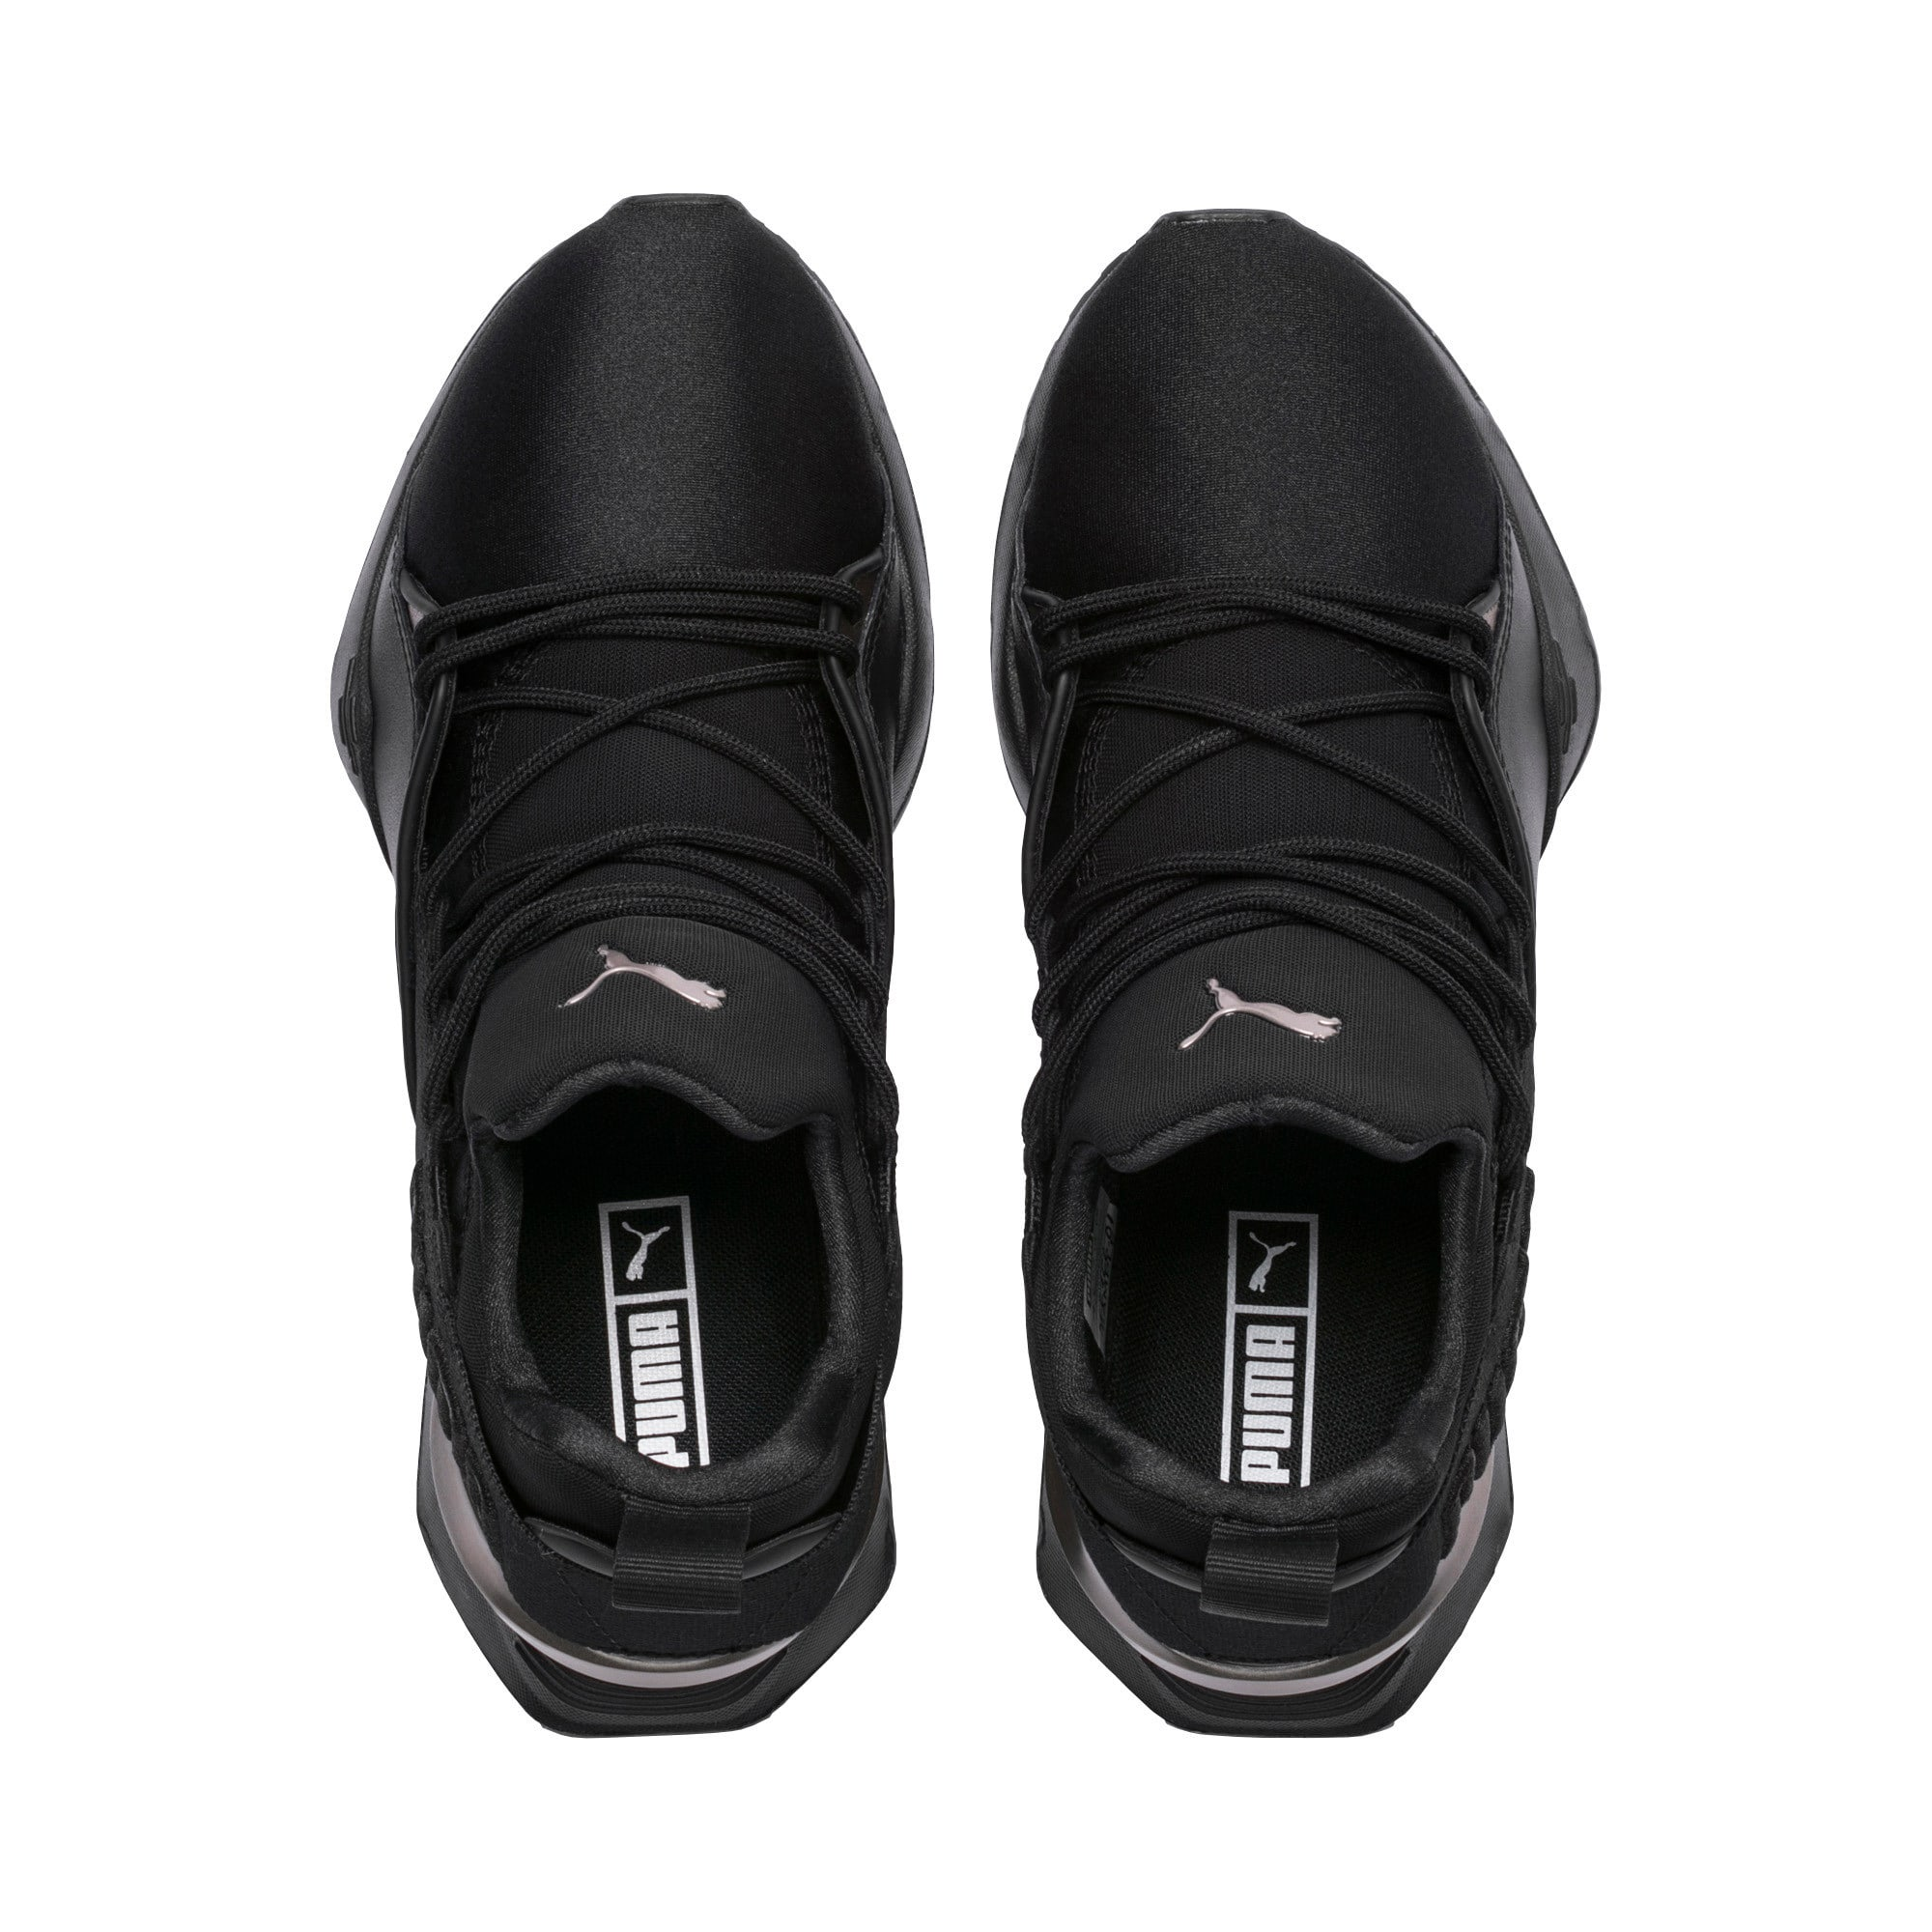 Thumbnail 6 of Muse Maia Luxe Women's Sneakers, Puma Black-Puma Black, medium